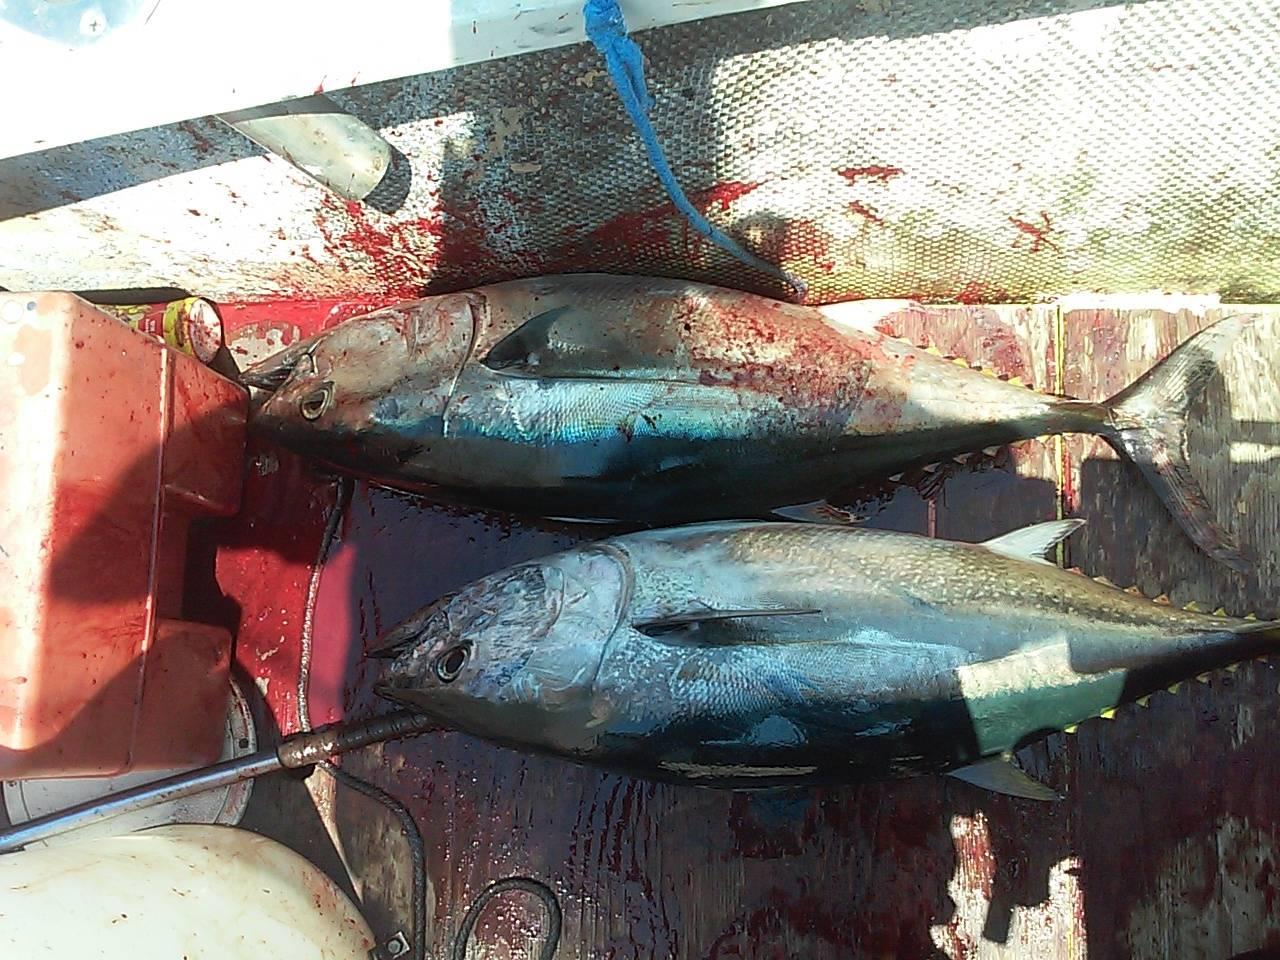 Bluefin off la jolla saltwater fishing forums for La jolla fishing